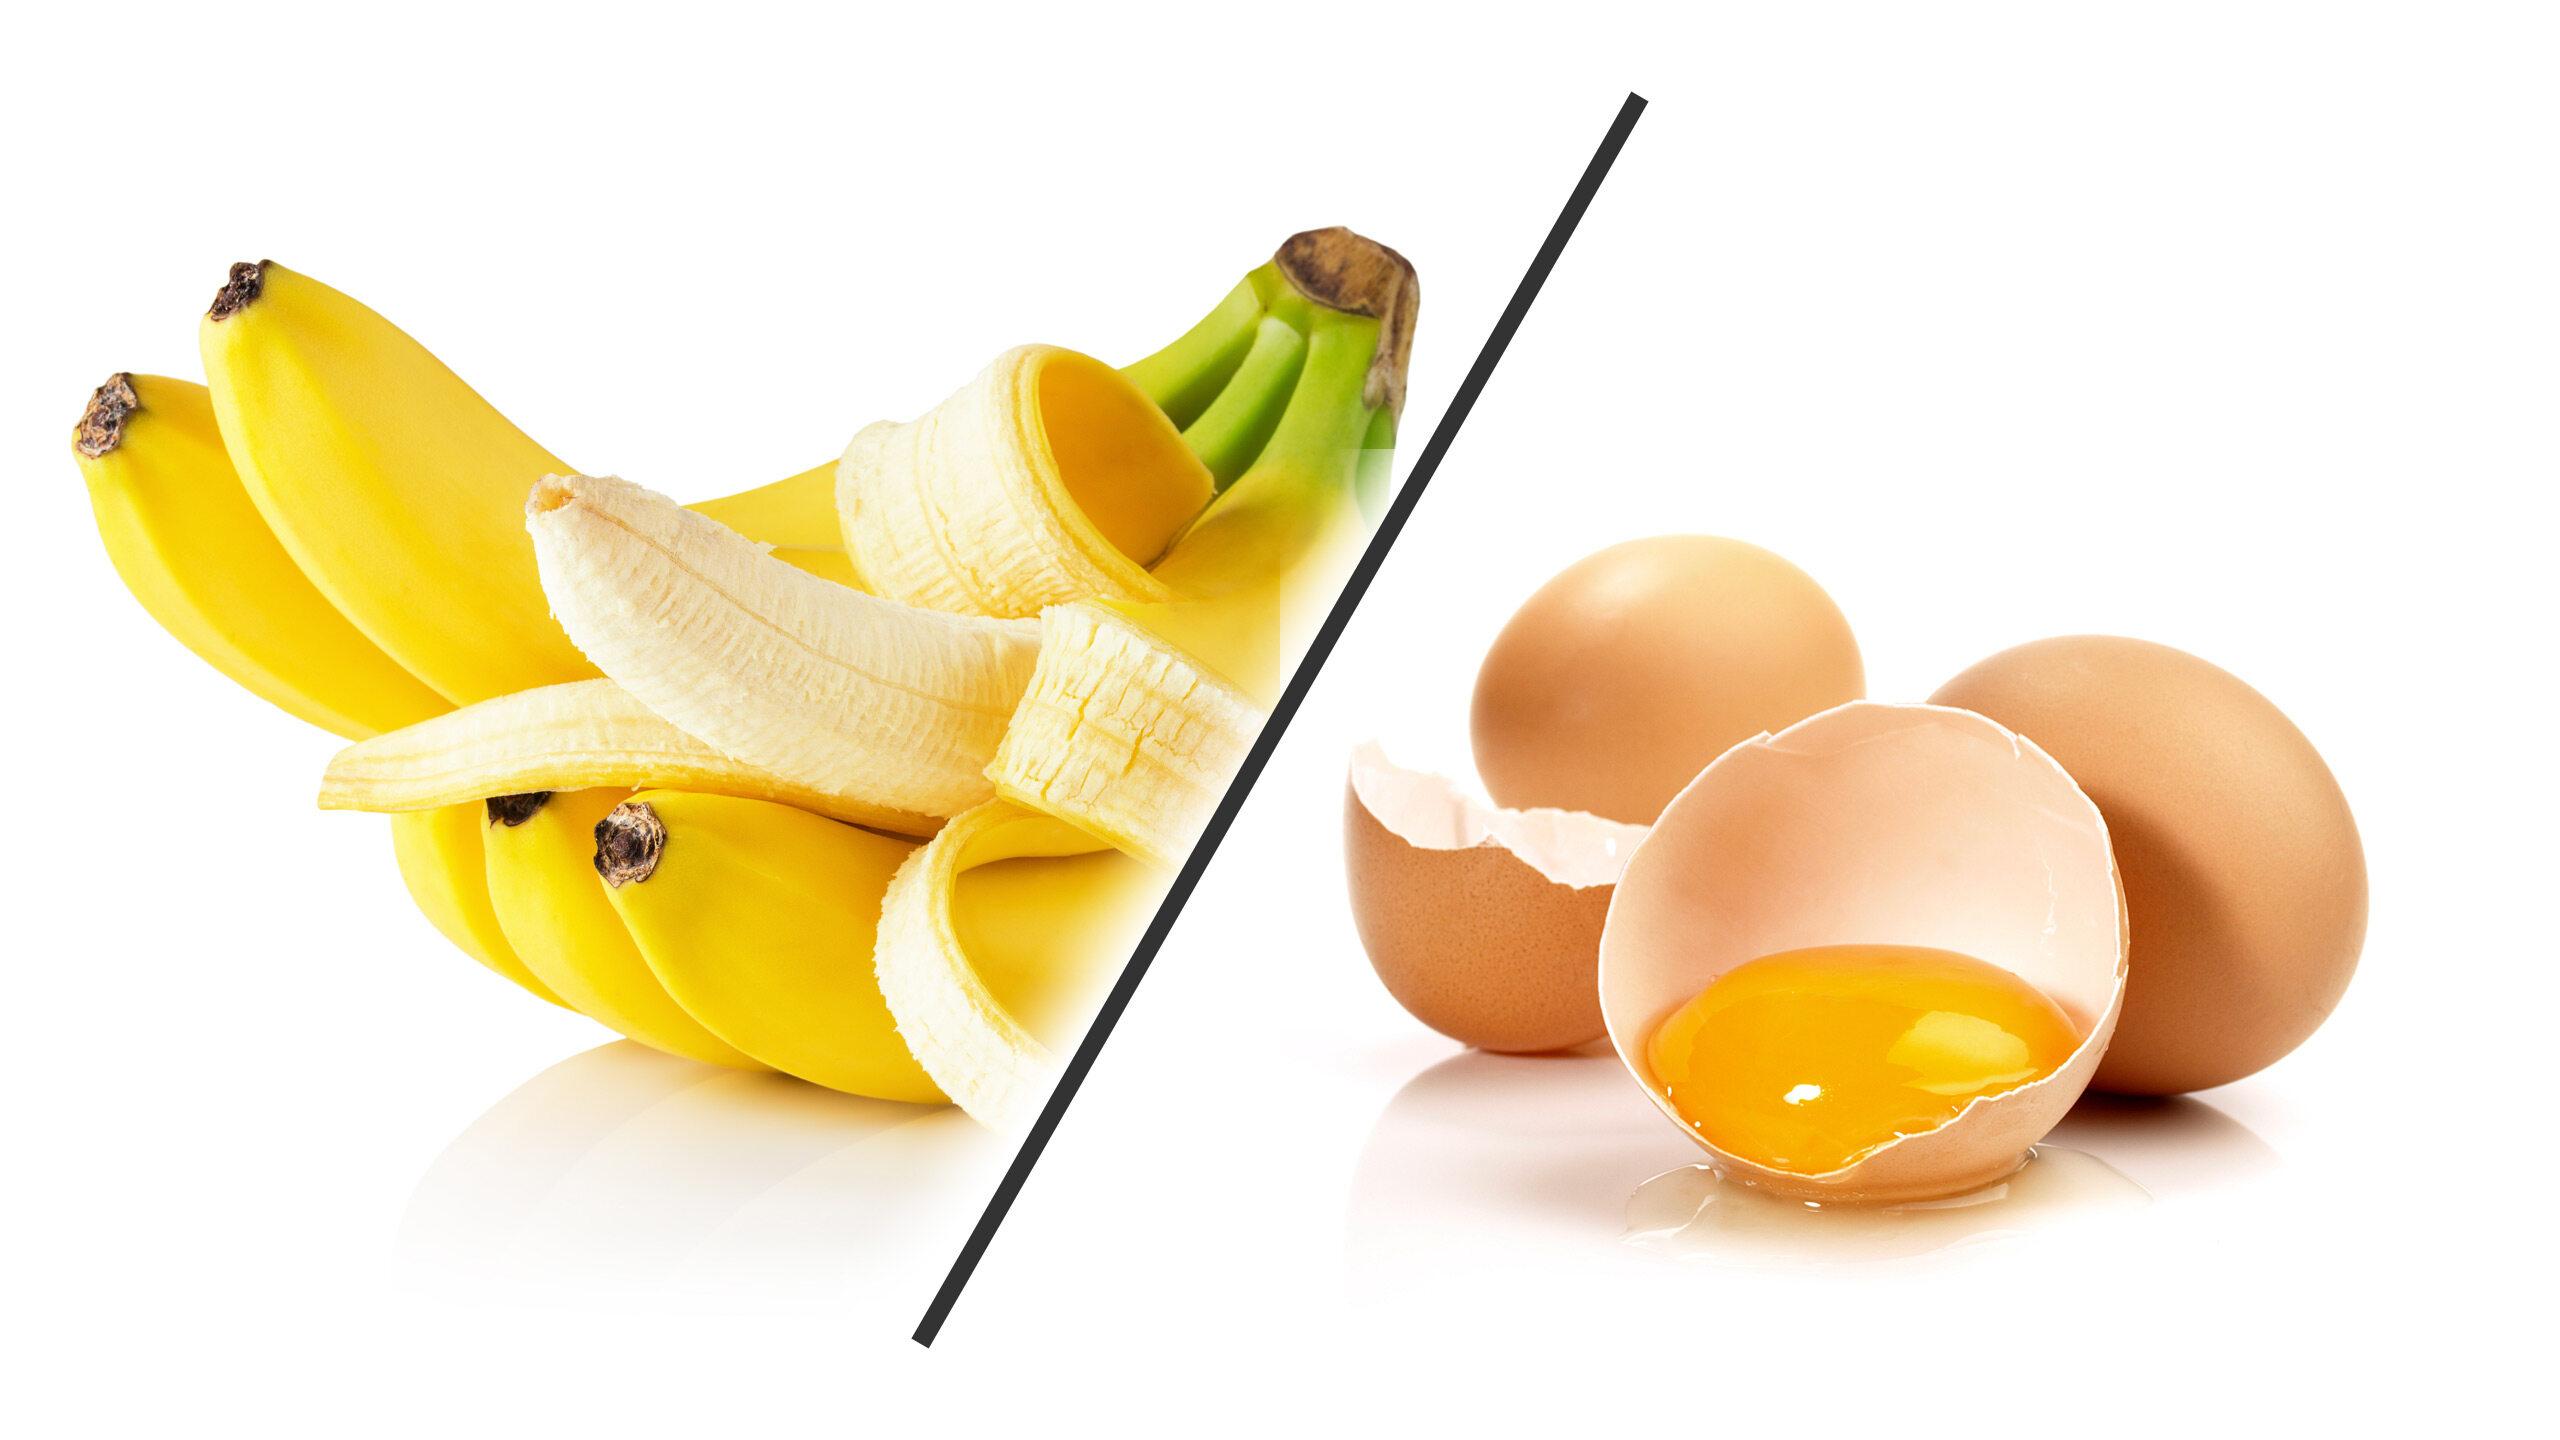 Banan kontra jajko - ilustracja